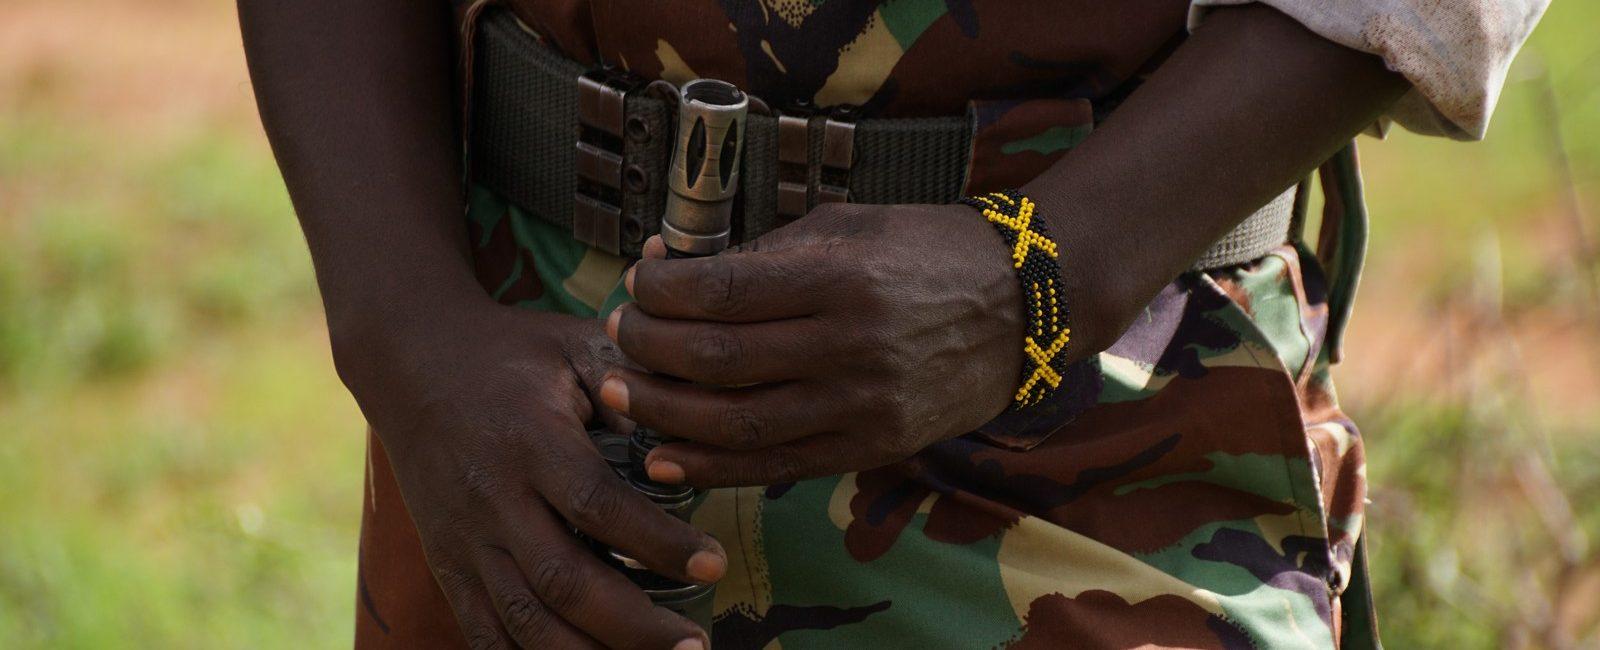 Image of an armed ranger in Kenya